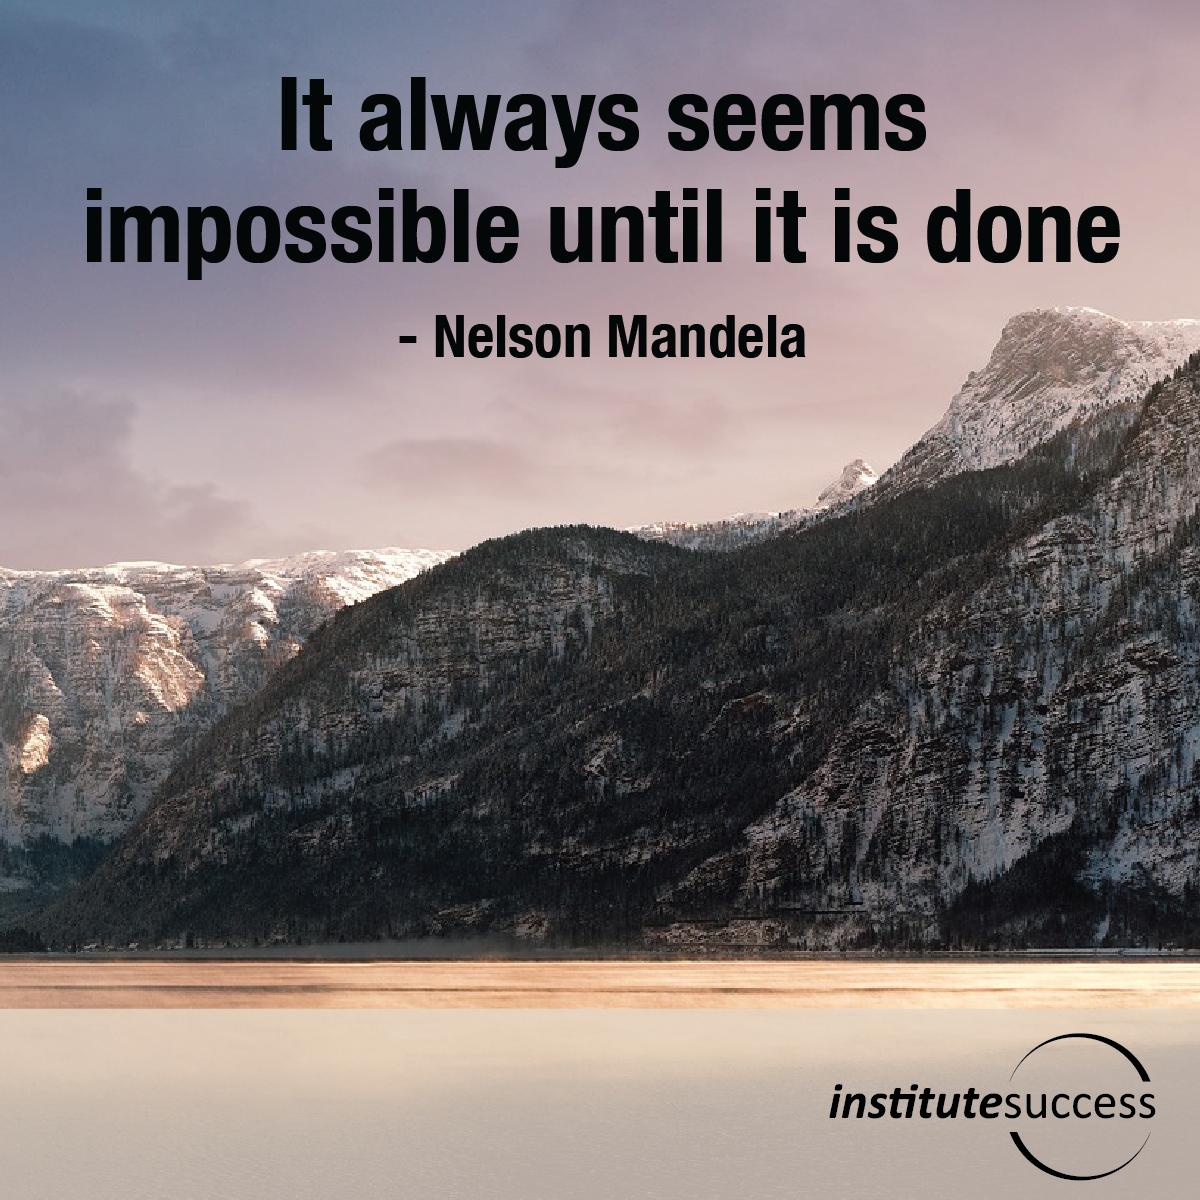 It always seems impossible until it is done – Nelson Mandela